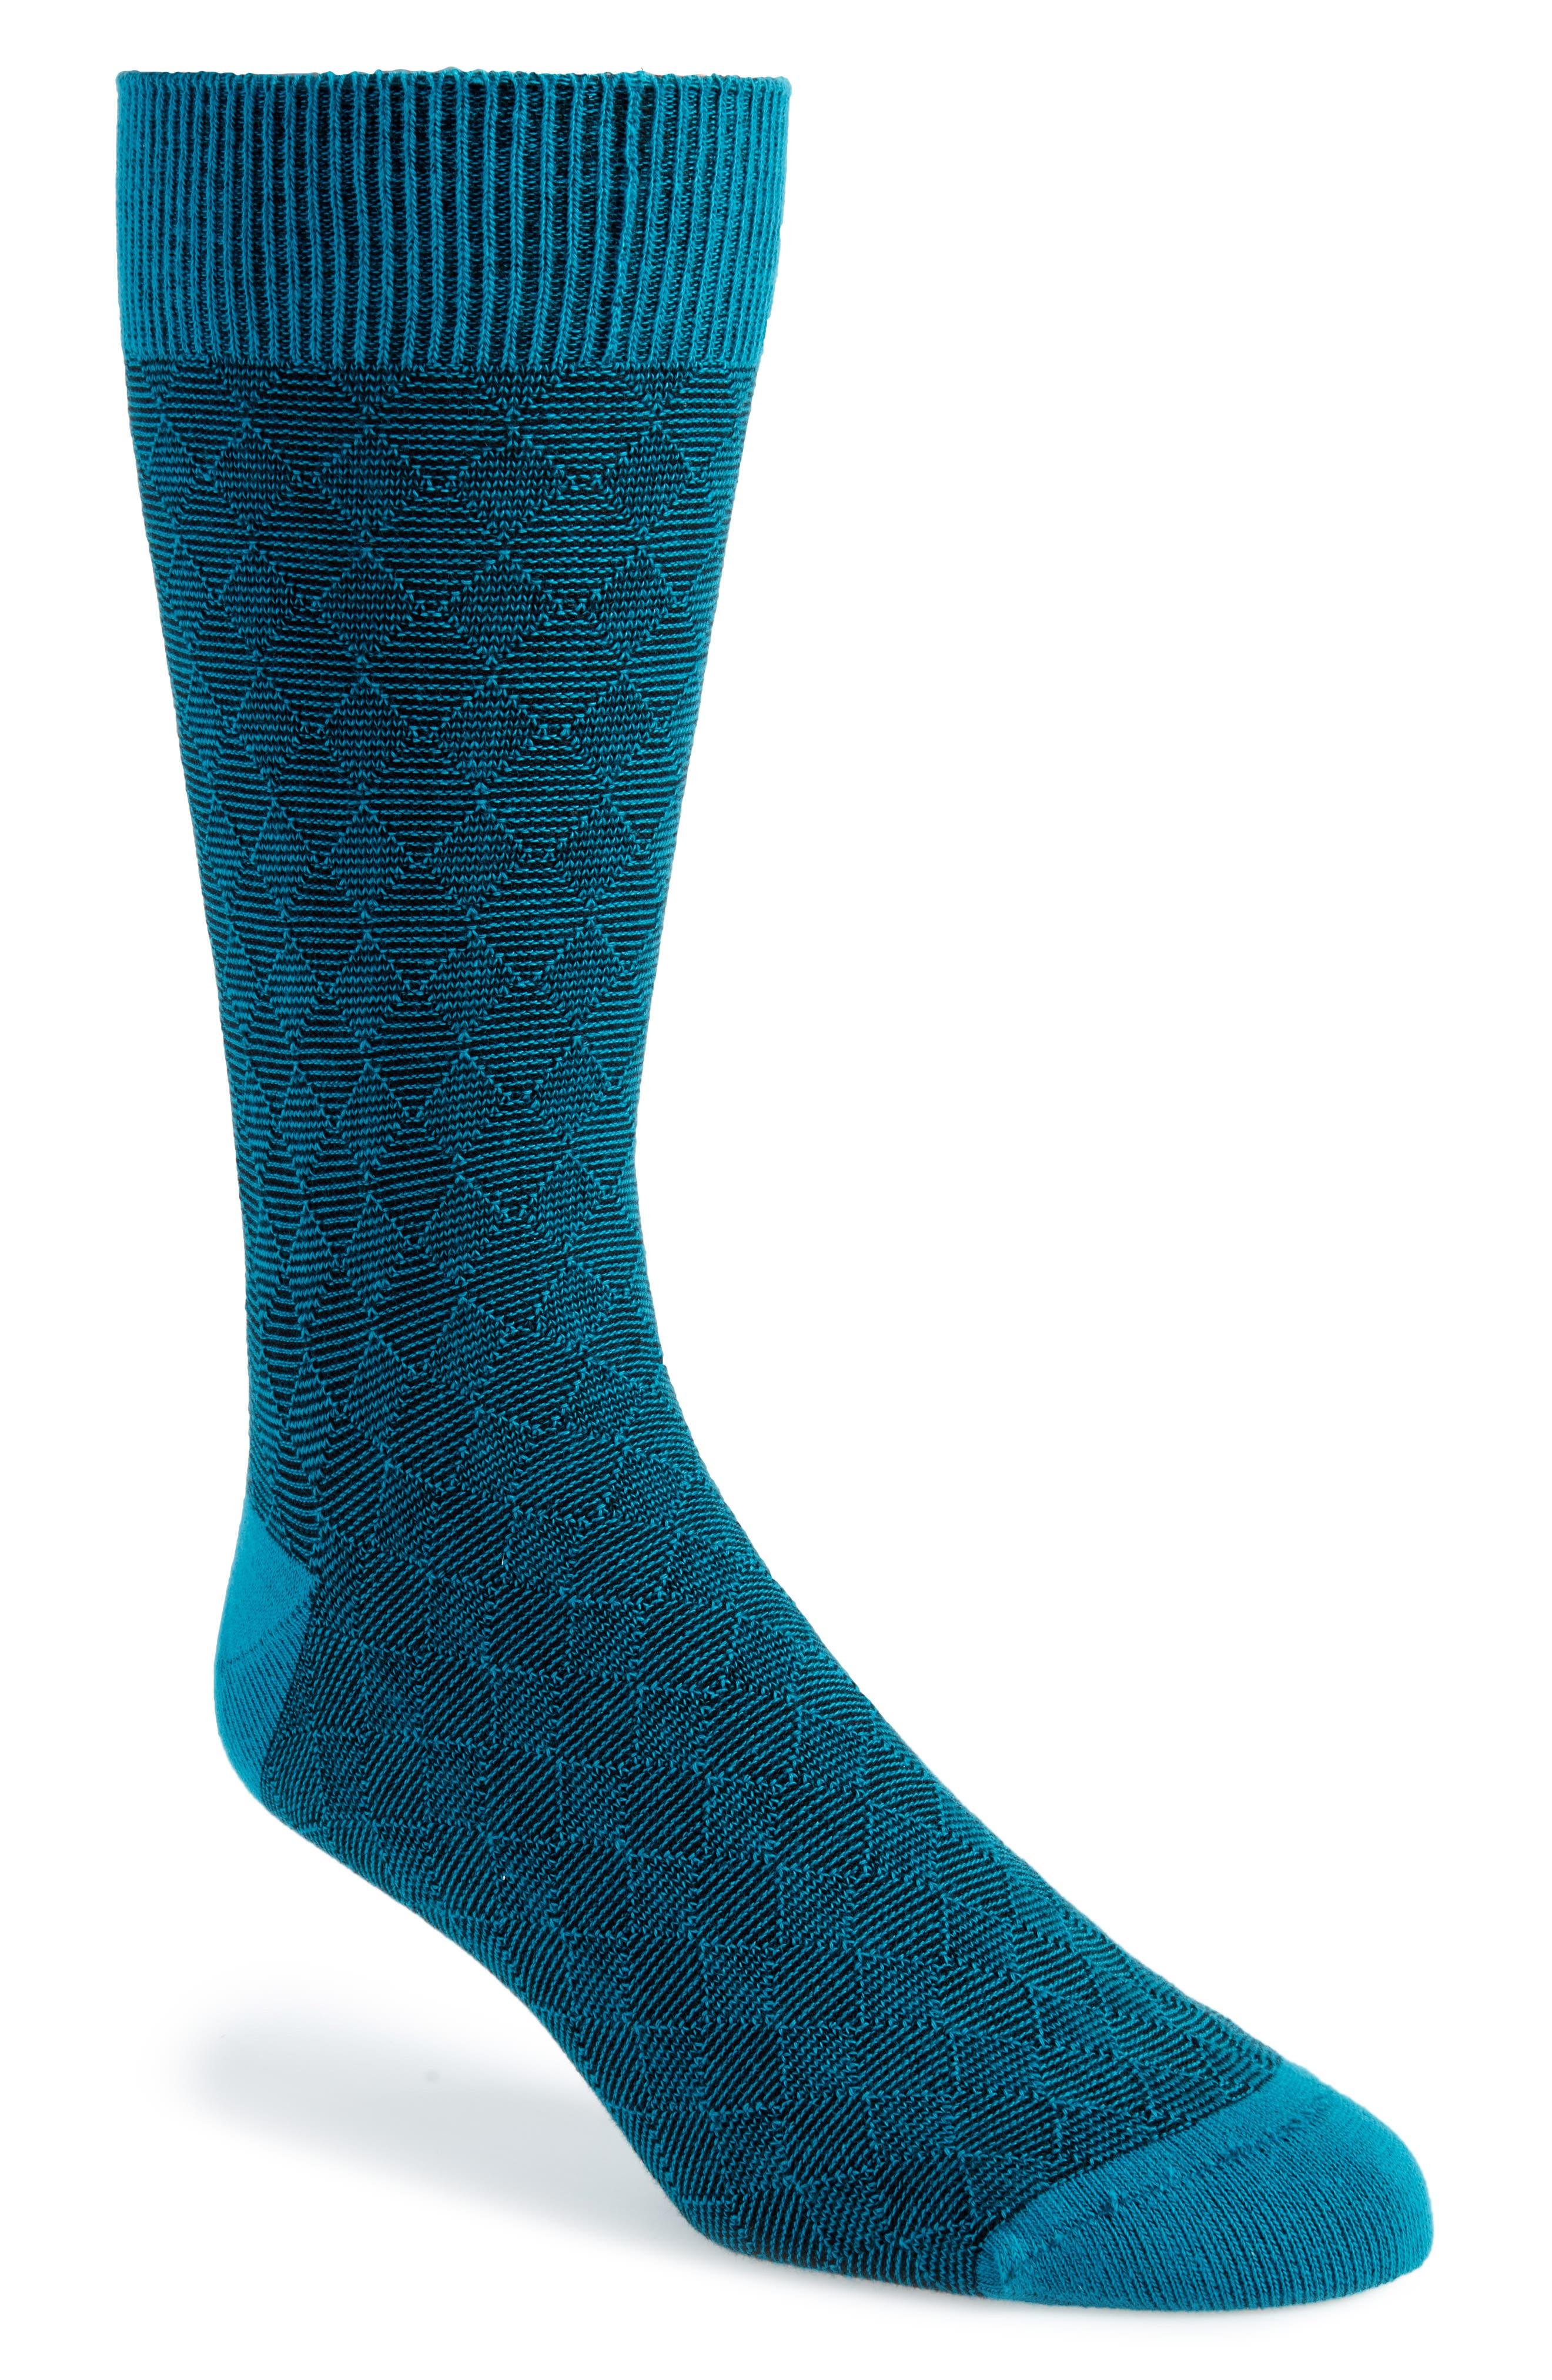 Diamond Textured Socks,                             Main thumbnail 1, color,